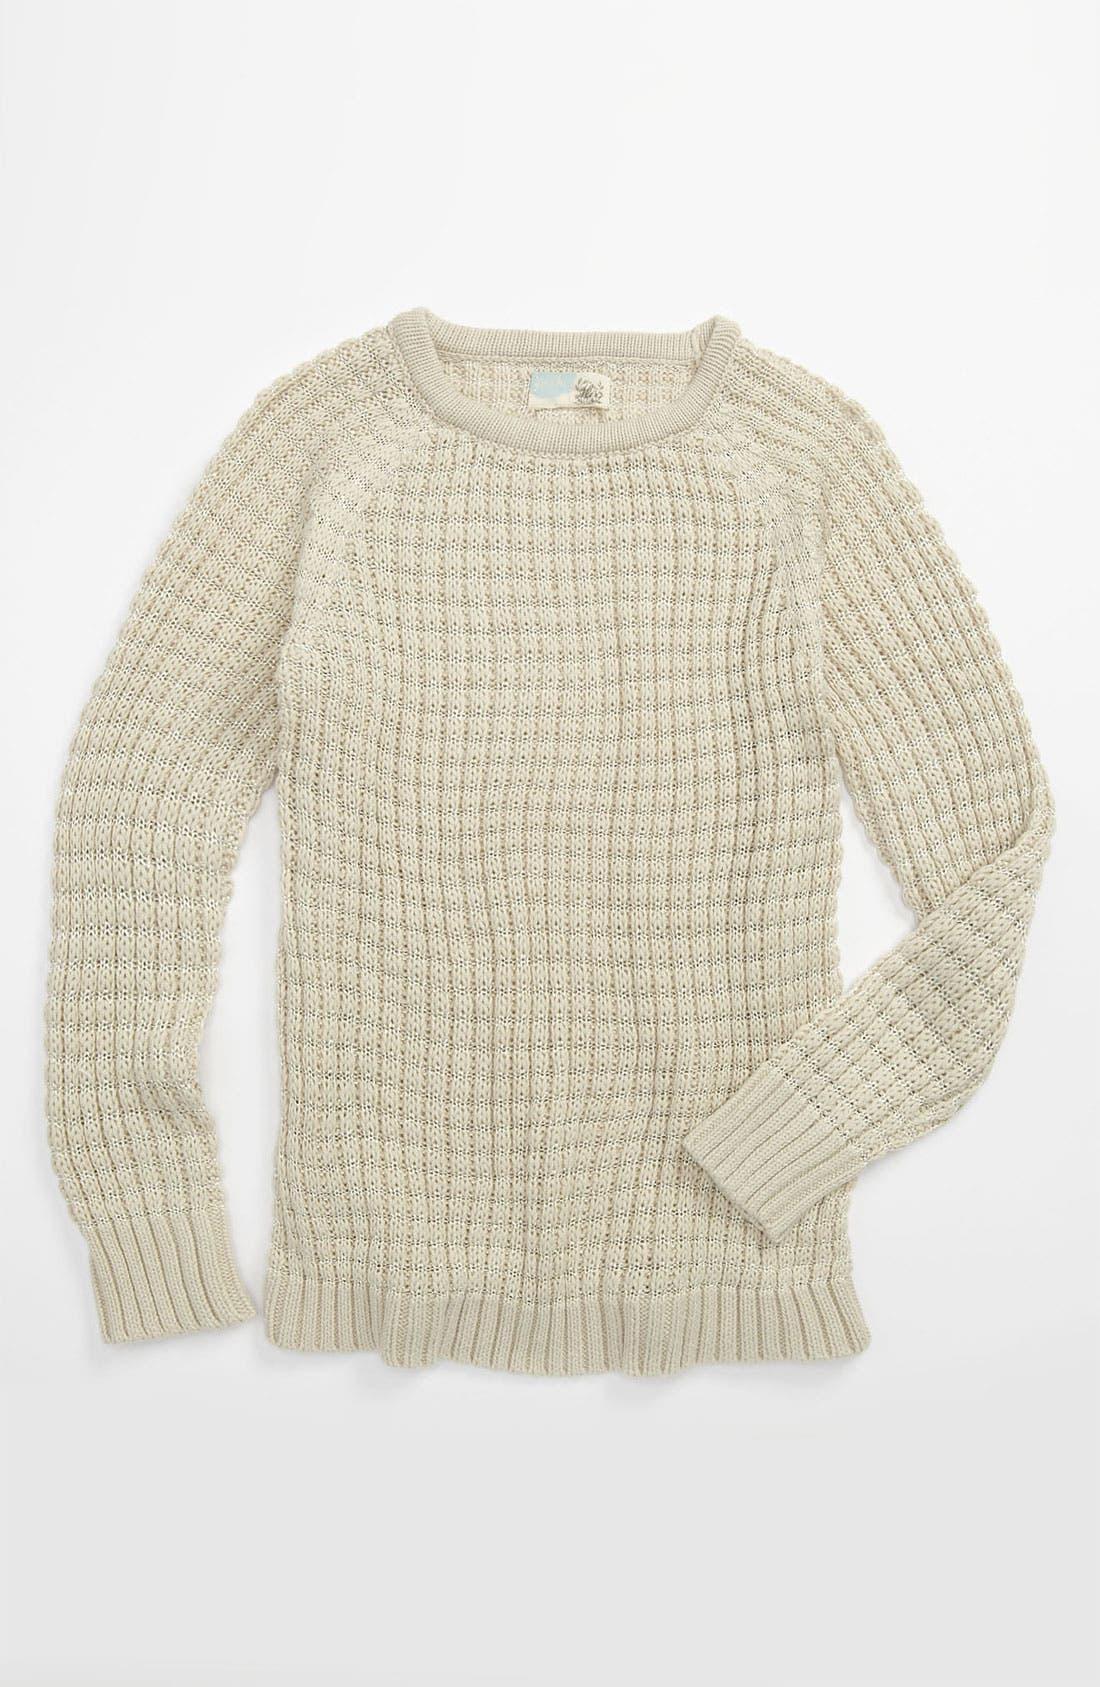 Main Image - Peek 'Tres' Sparkle Knit Crewneck Sweater (Toddler, Little Girls & Big Girls)